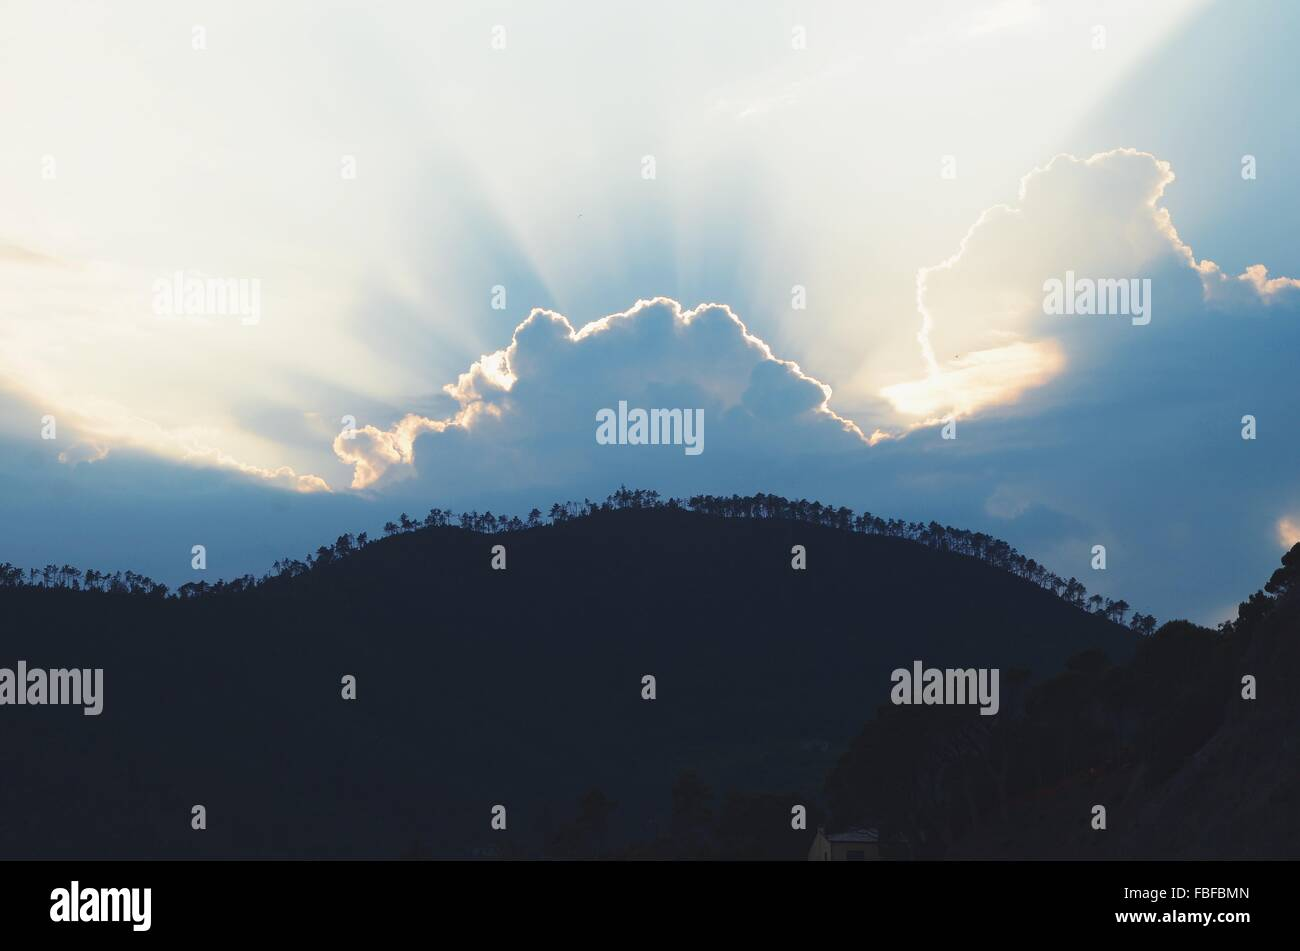 Silhouette Landscape Against Scenic Sky - Stock Image